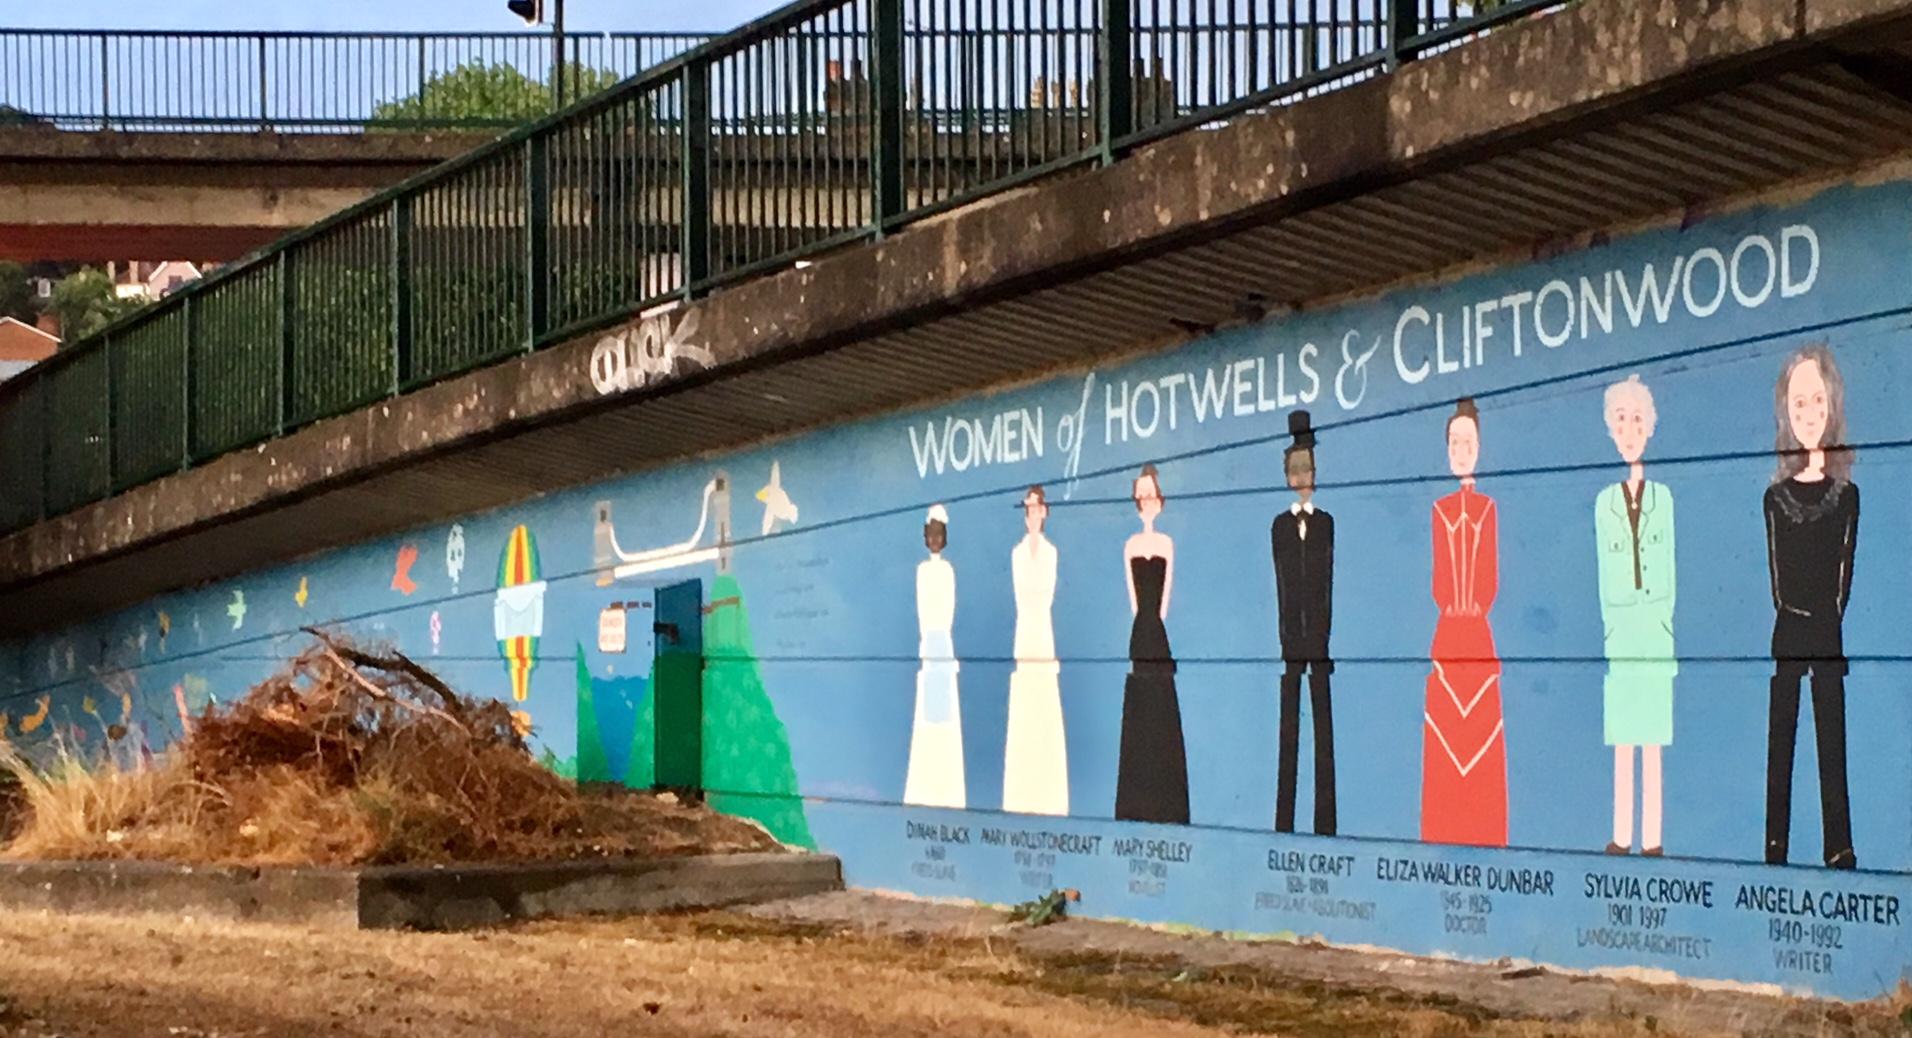 Local News - Hotwells & Cliftonwood Community Association